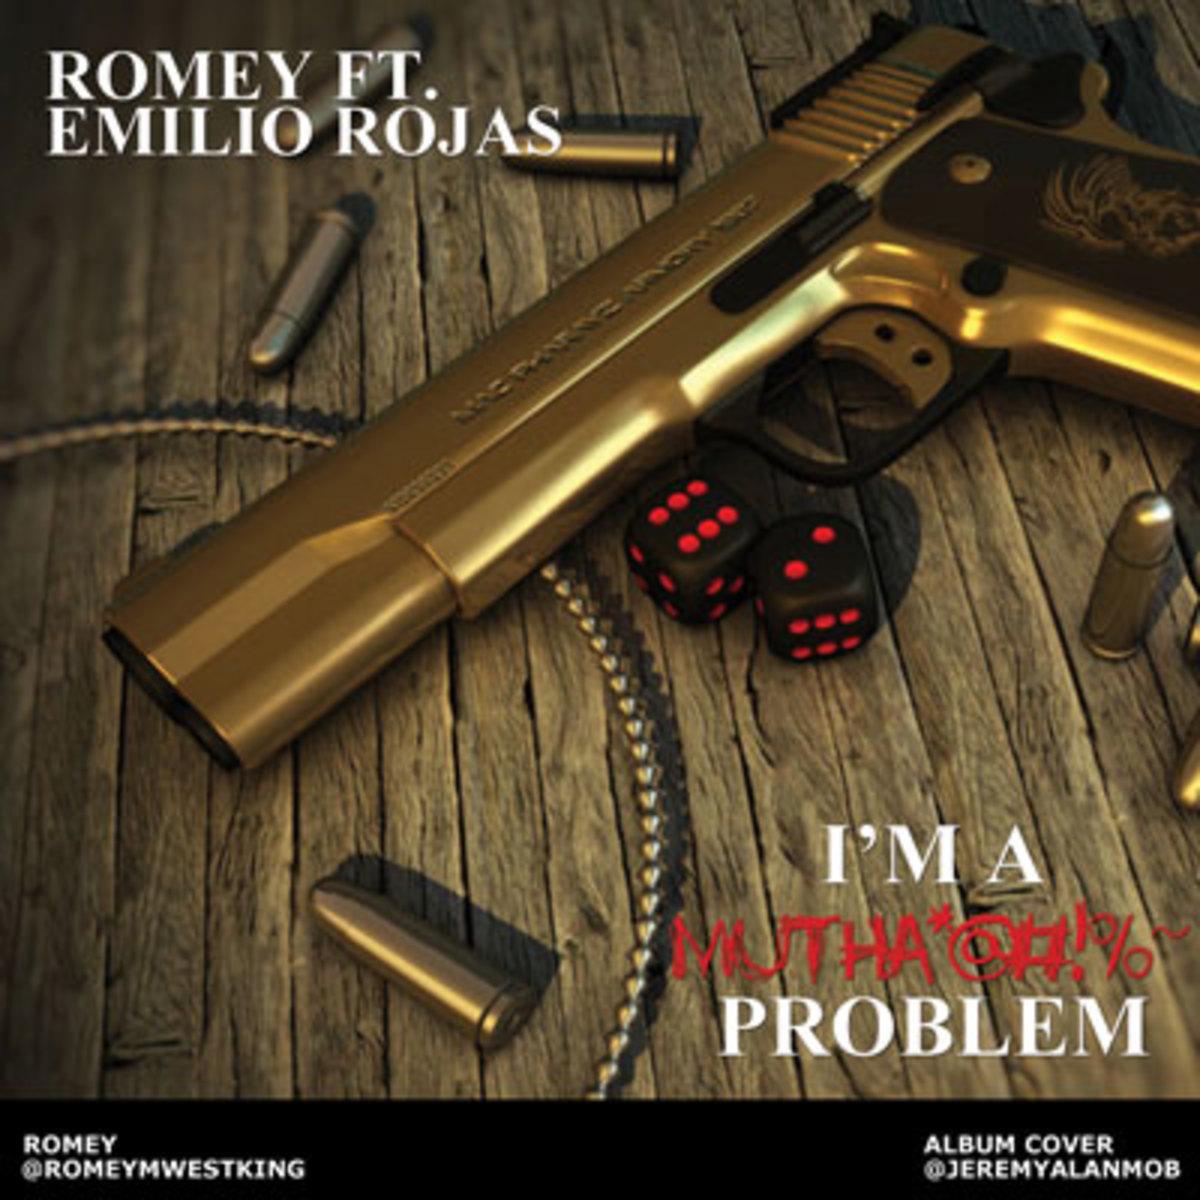 romey-imaproblem.jpg